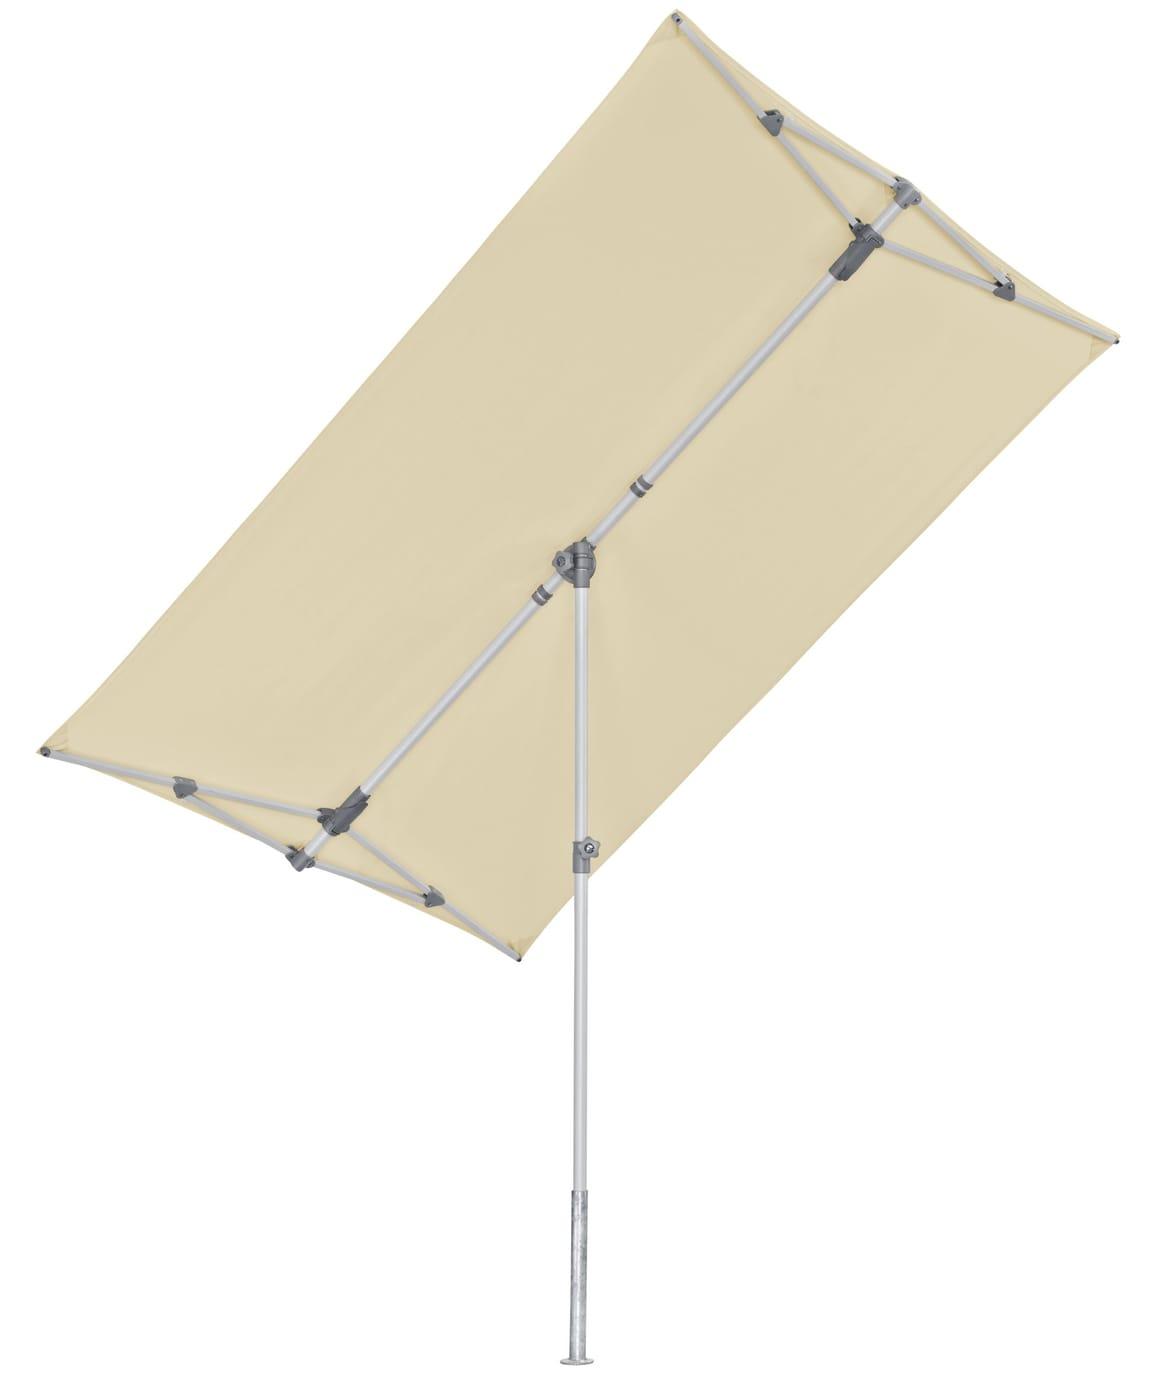 Suncomfort By Glatz Flex Roof Balkondach 210 X 150 Migros